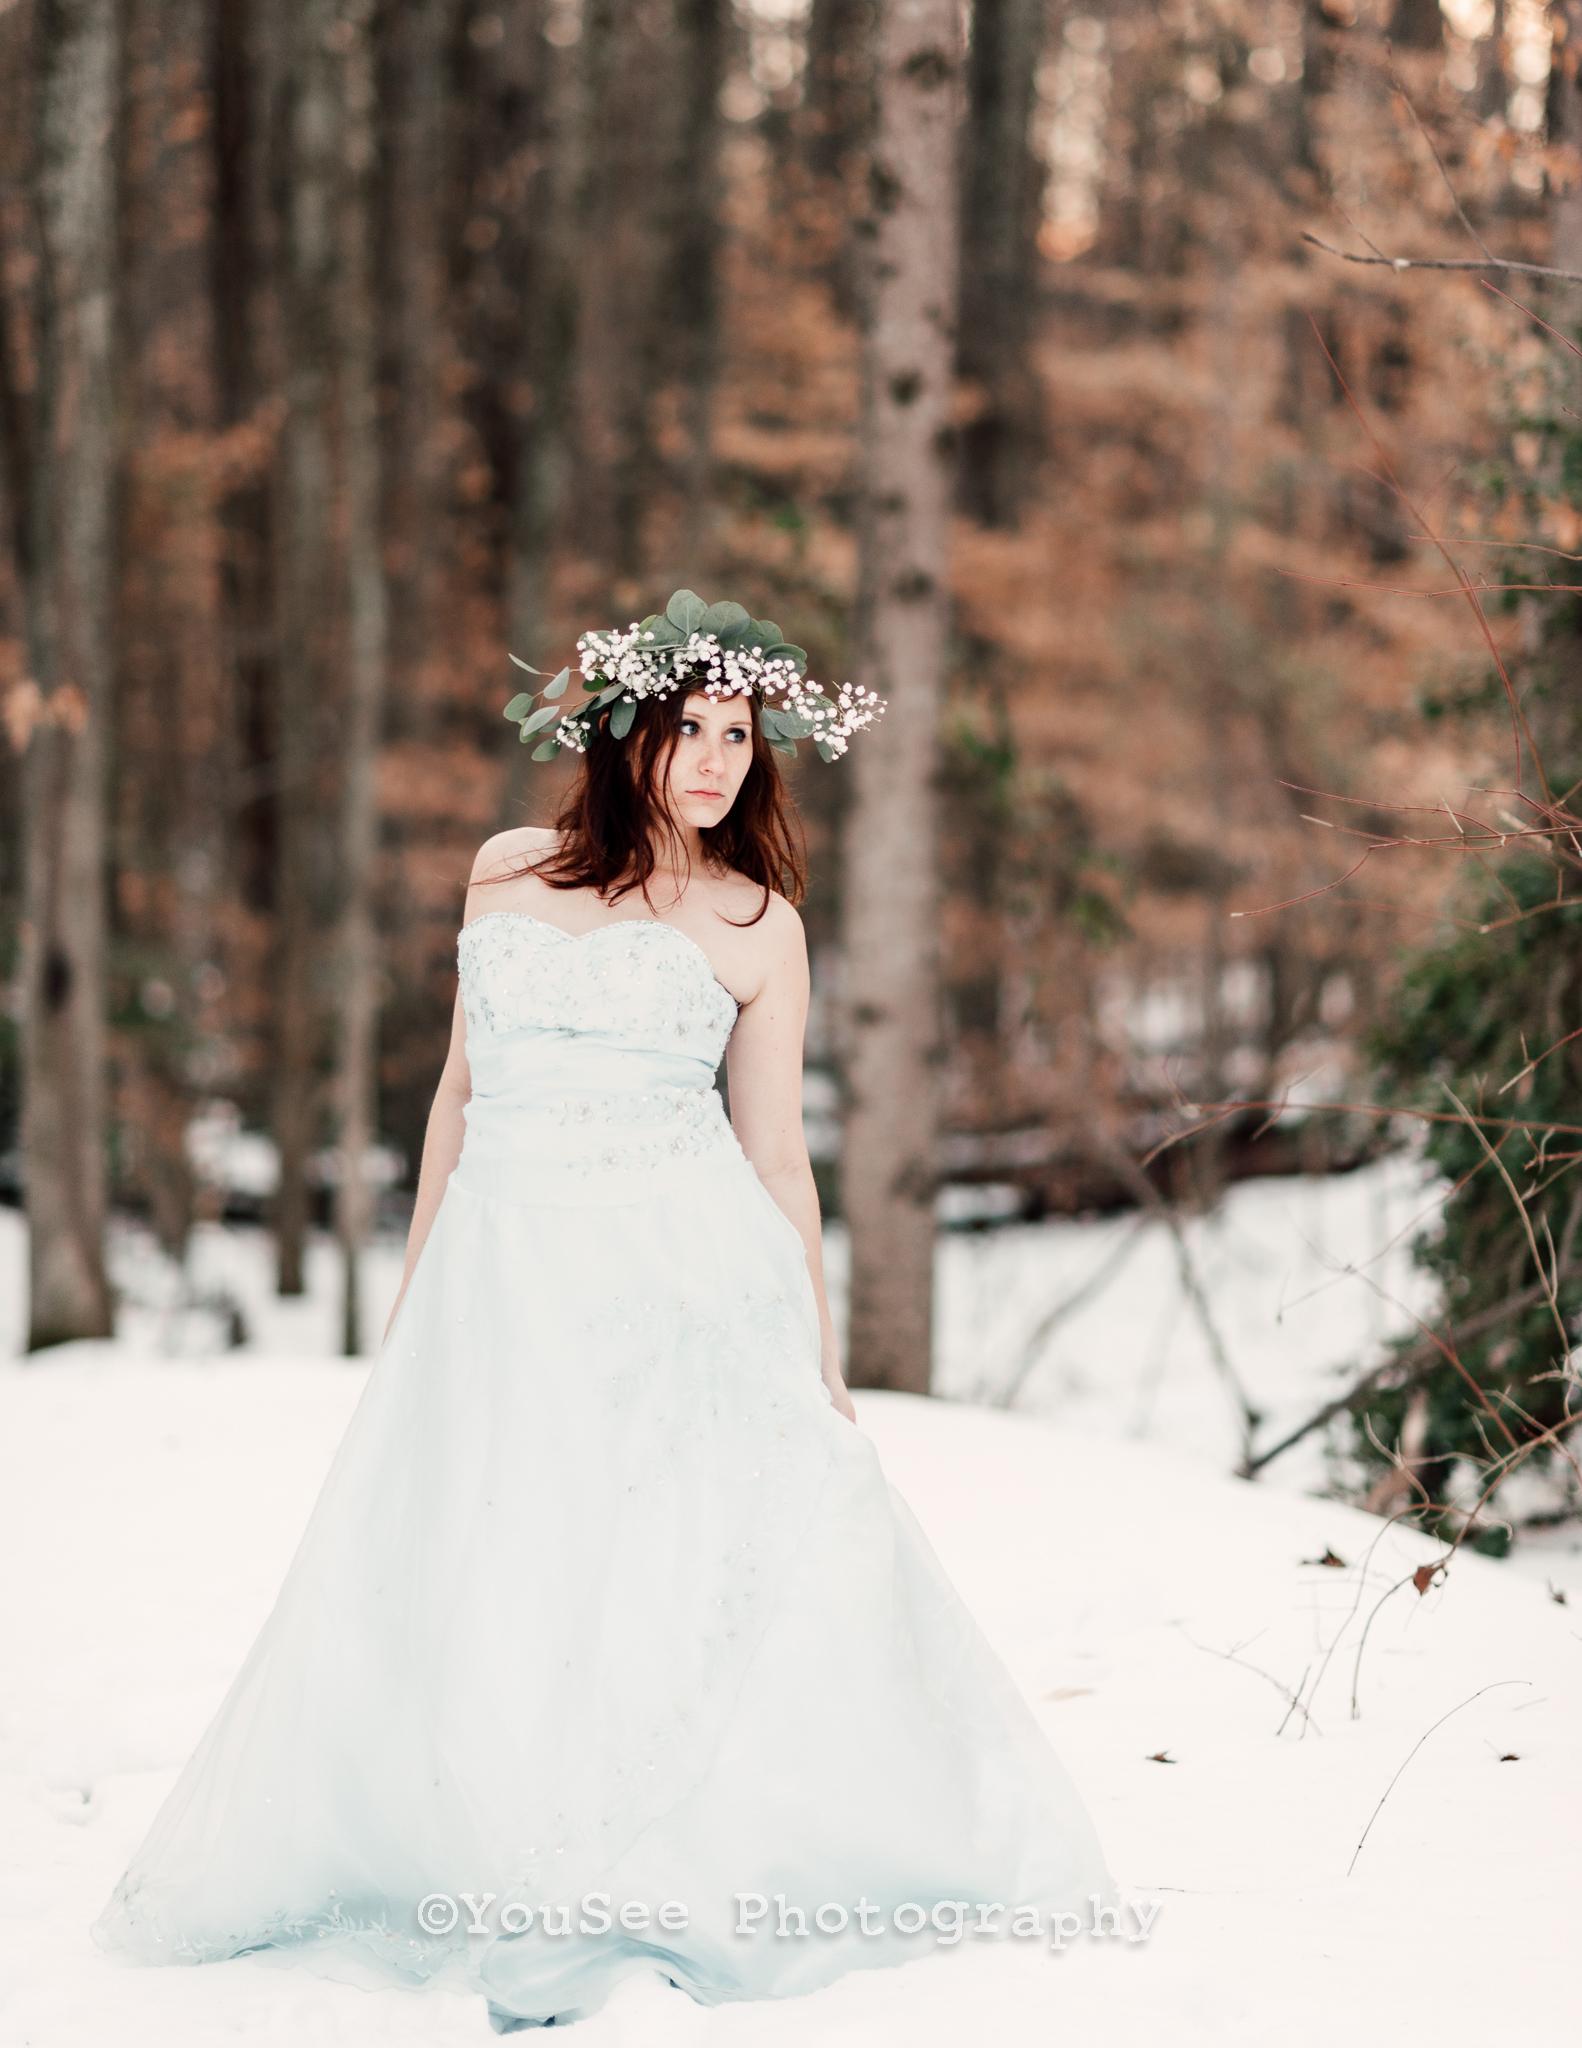 seniorportrait_fredericksburg_photography_winter2 (25)